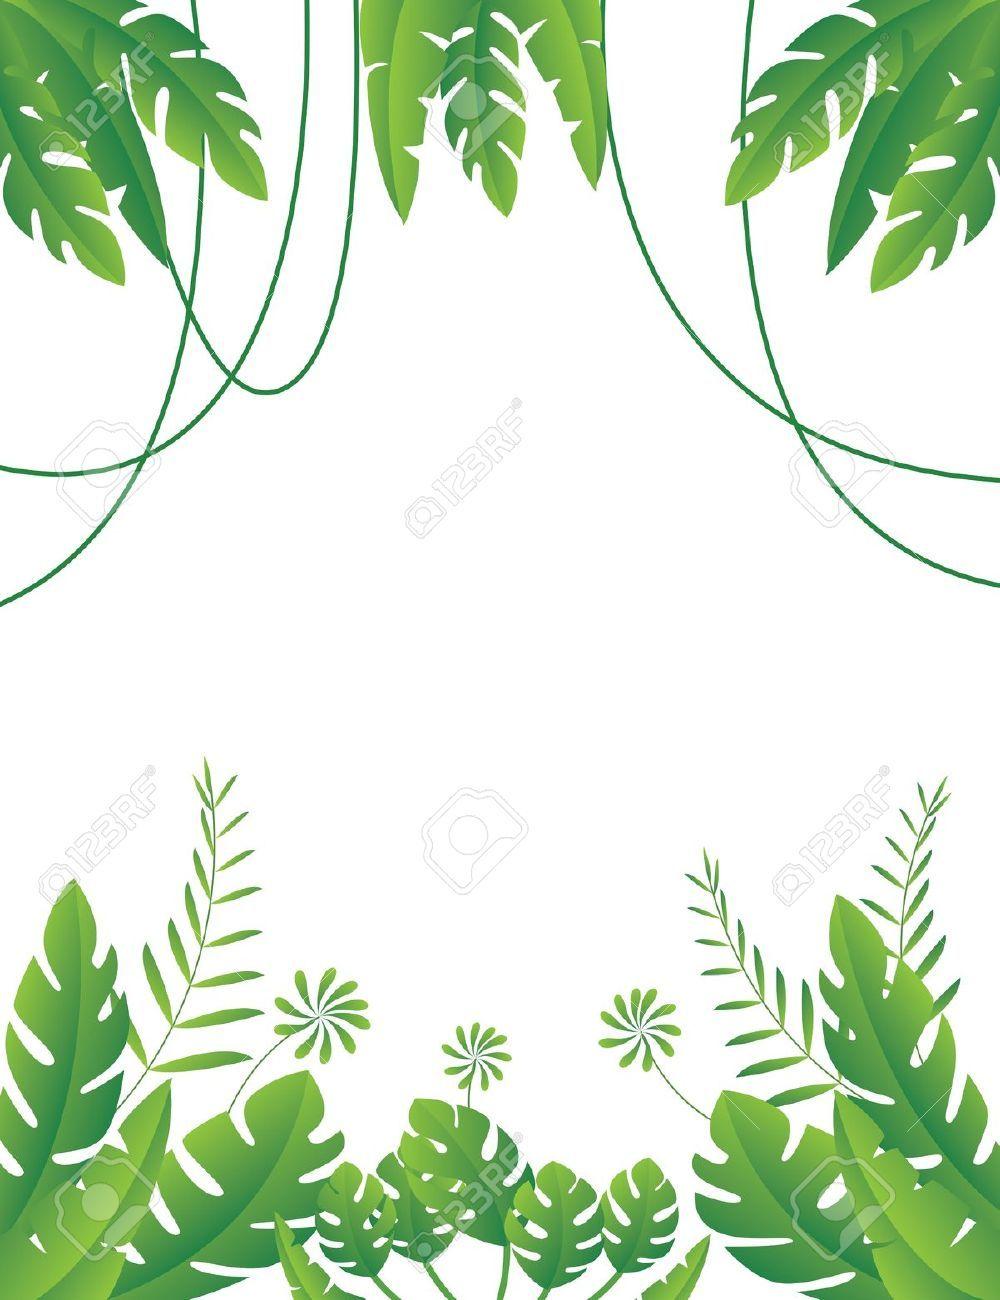 Branch clipart jungle. Foliage safari party pinterest